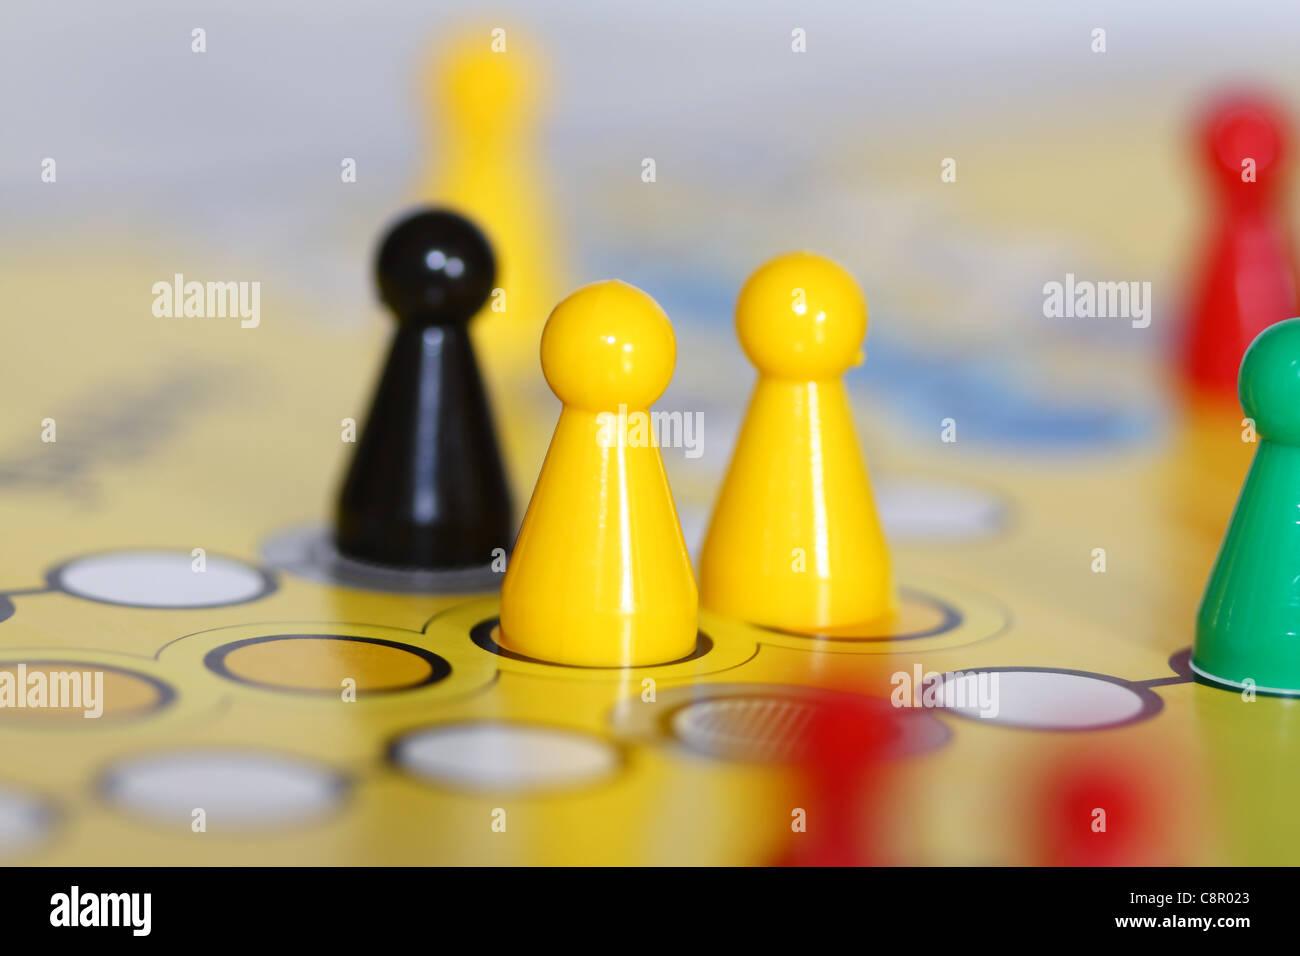 Board figures - Stock Image